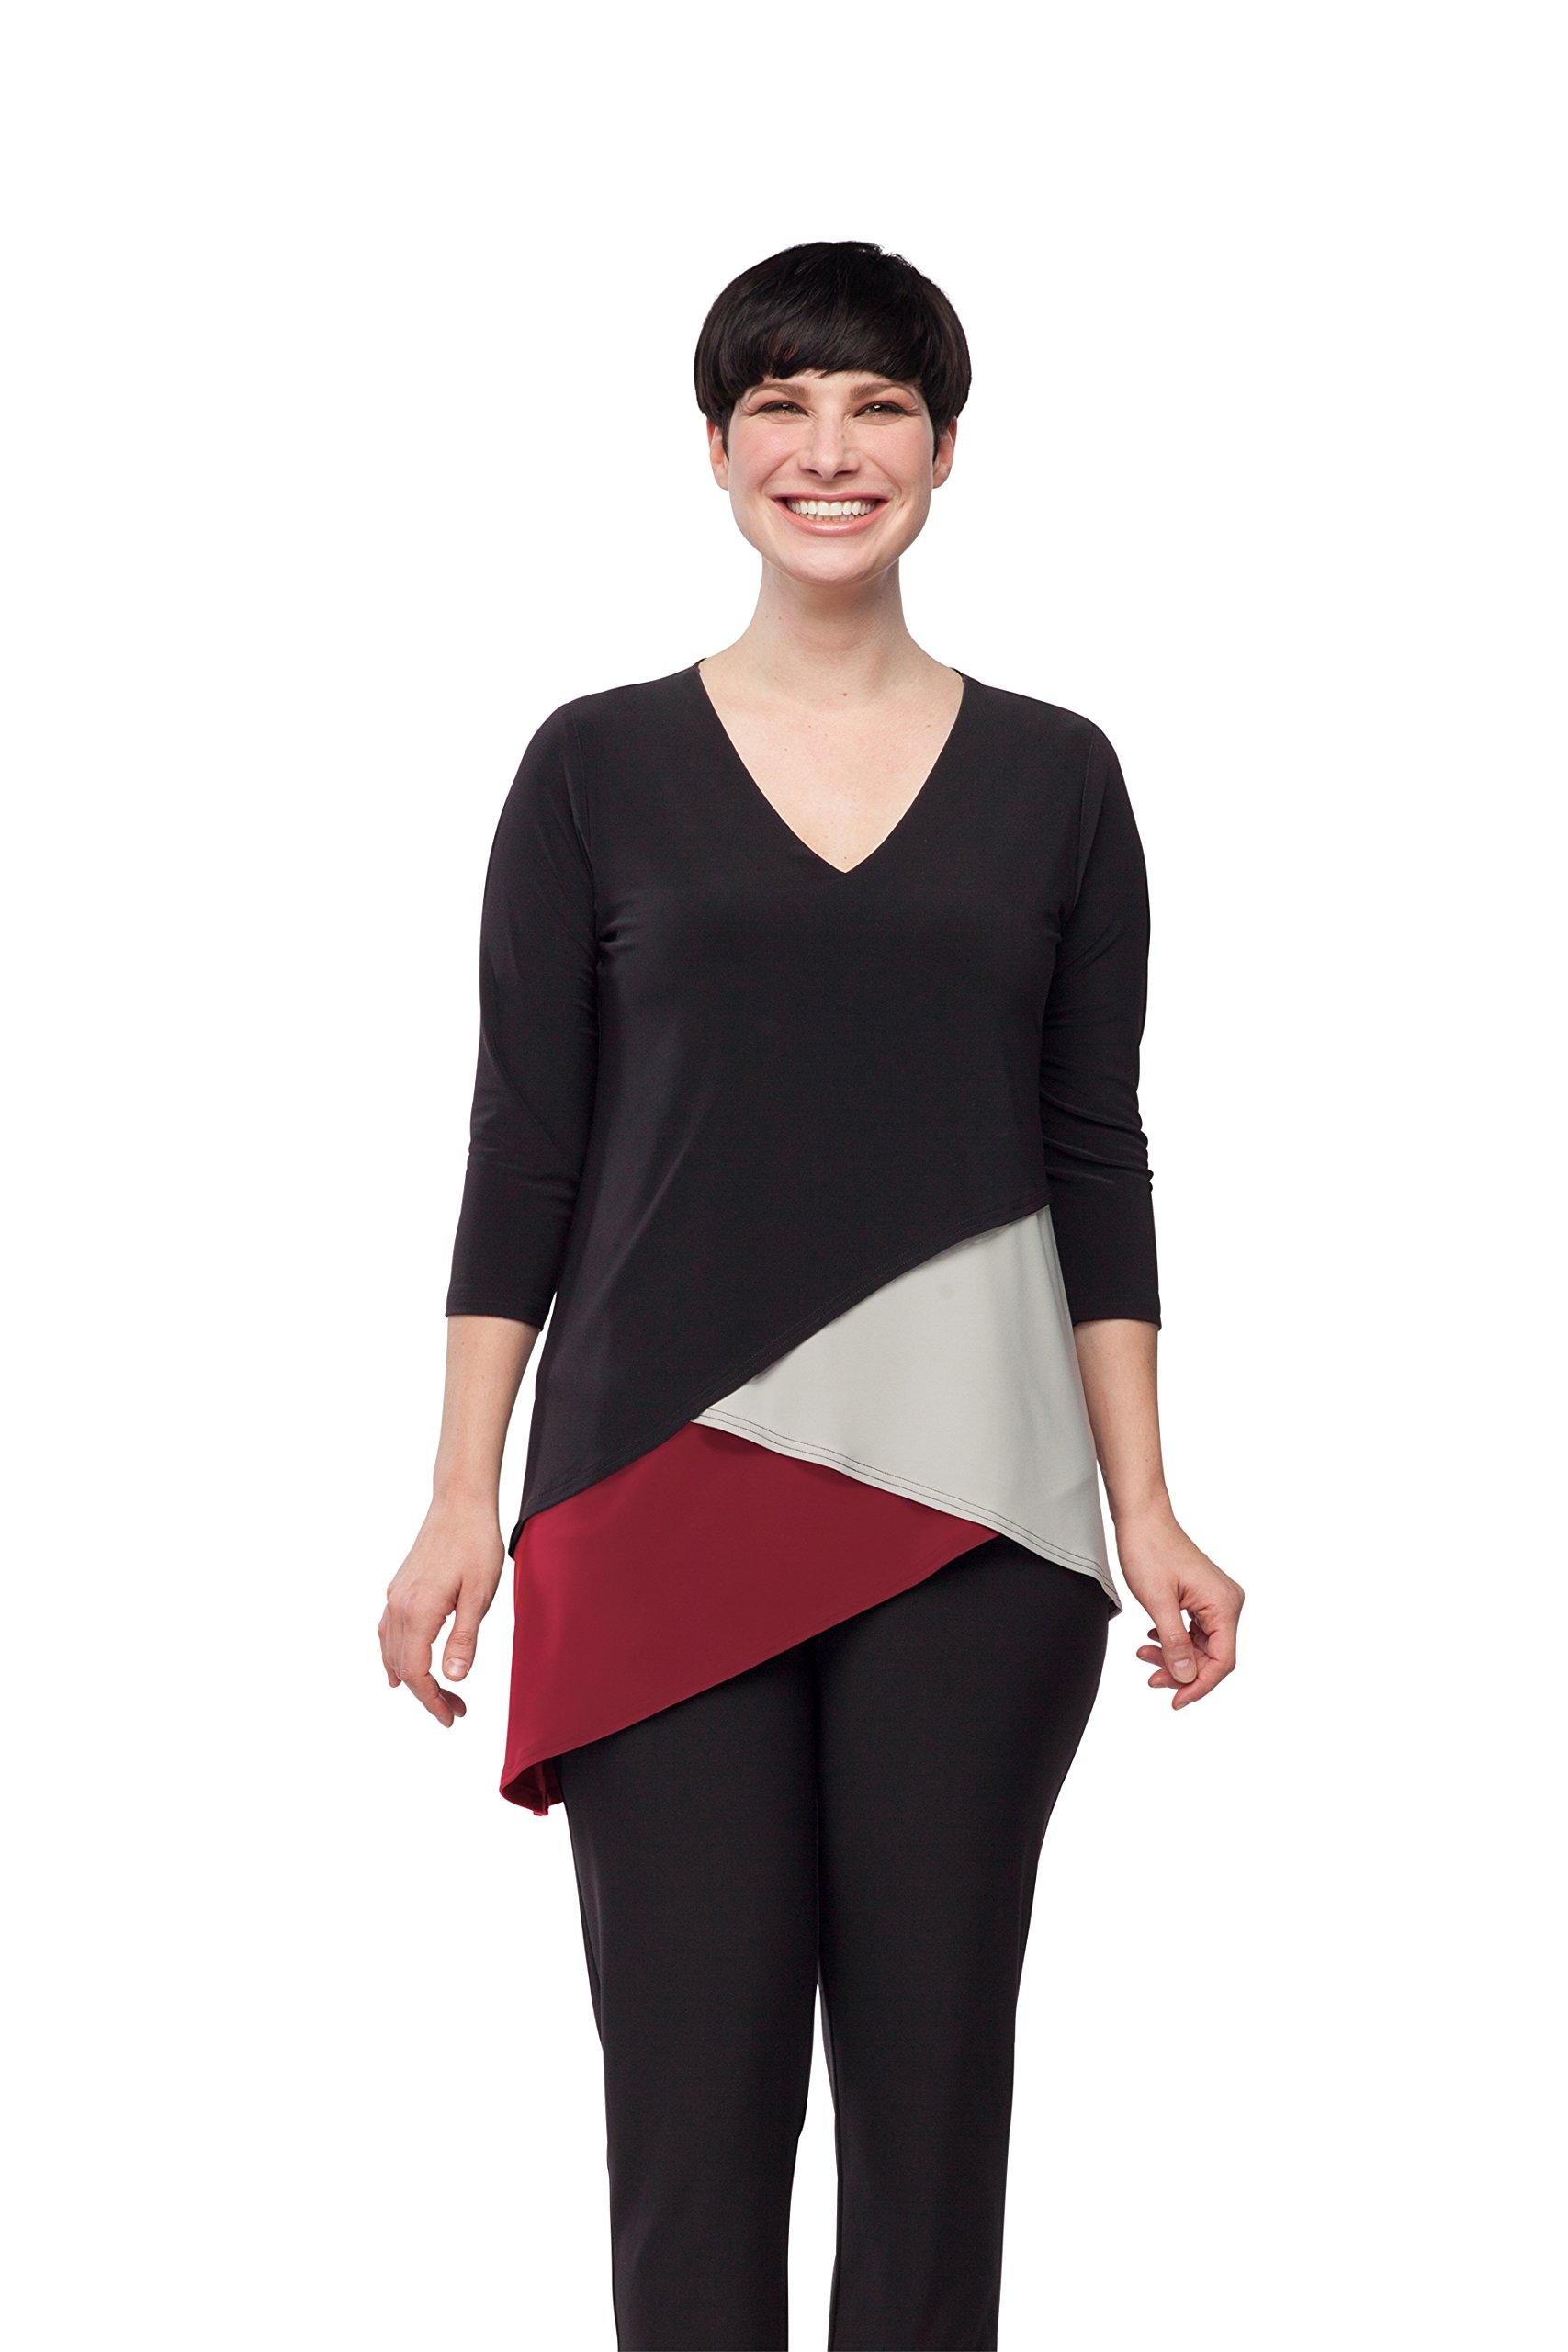 Sympli Women's Matrix Layer Top-Scarlett/Black/Oatmeal (Scarlett/Black/Oatmeal, 14-3Q Sleeve)